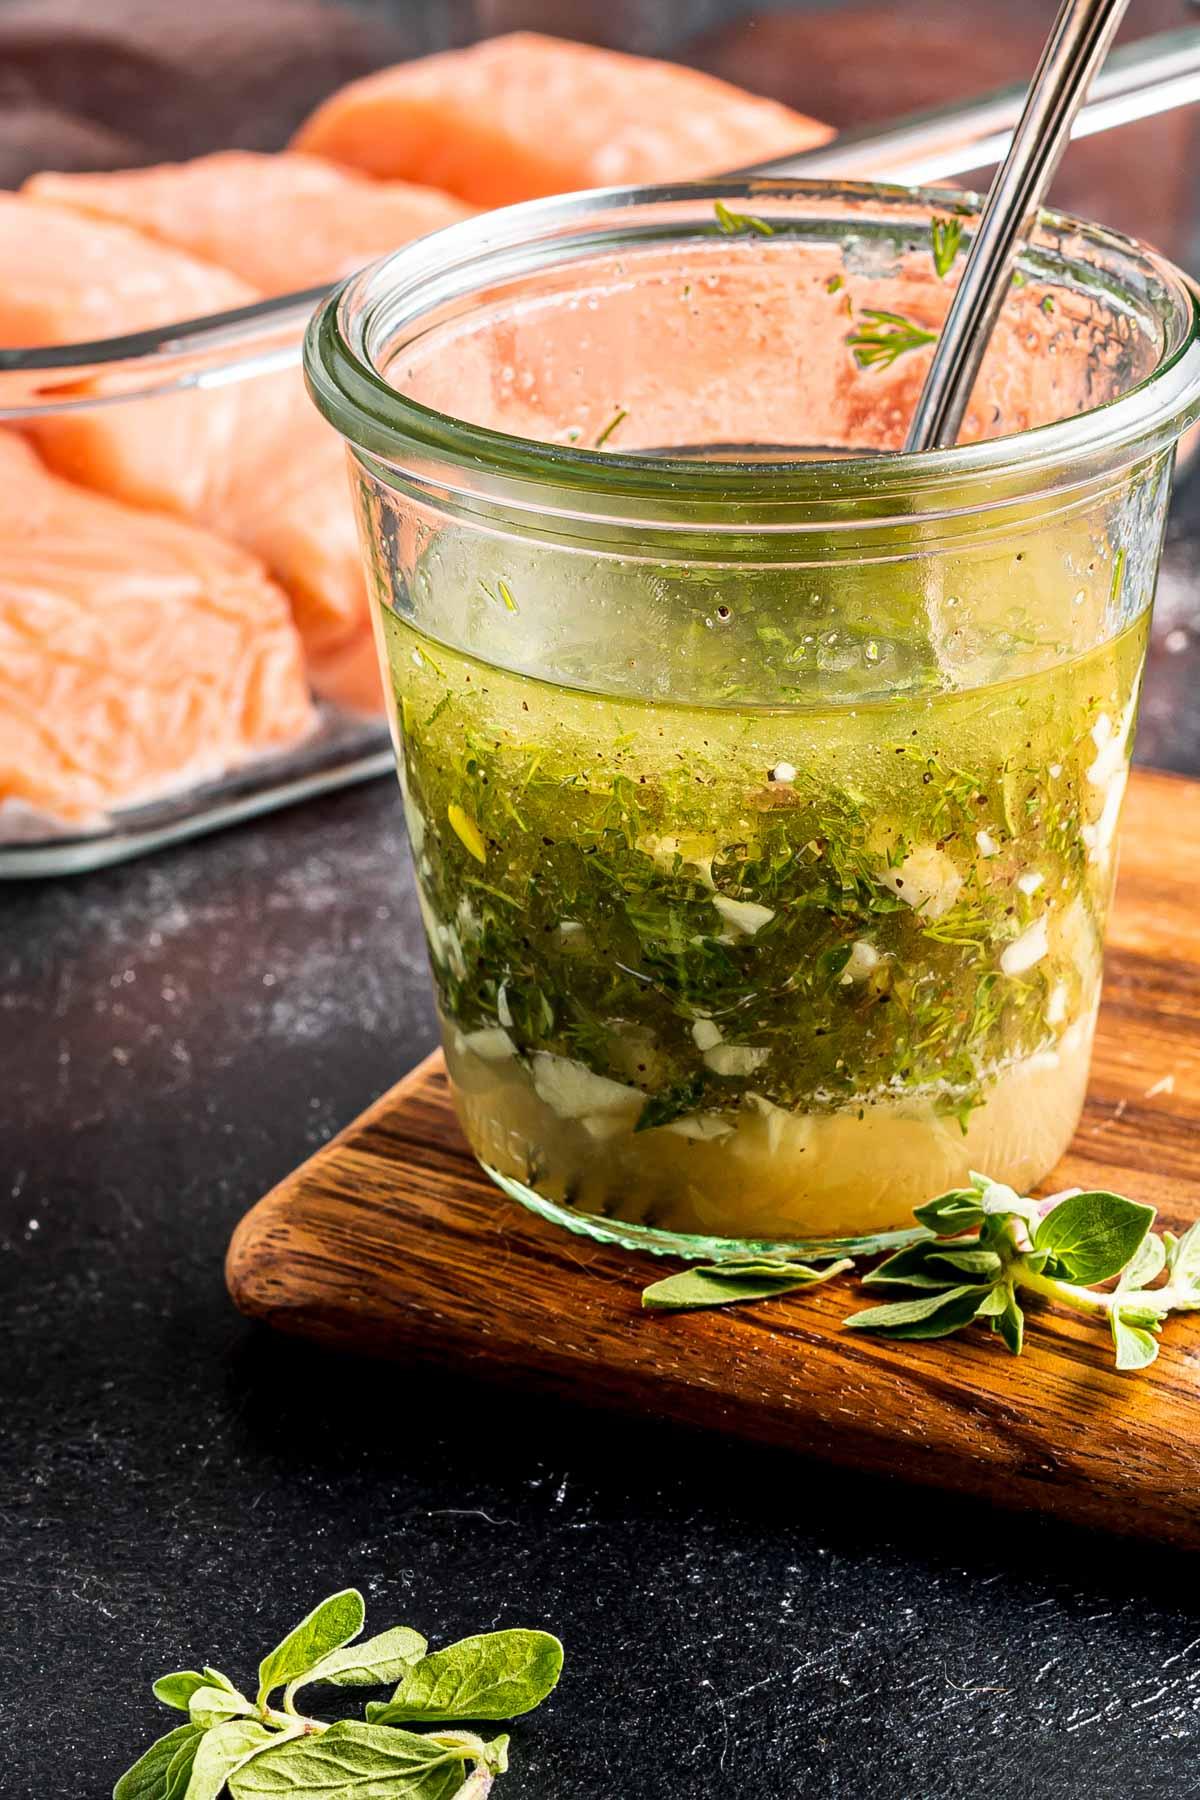 salmon marinade in jar